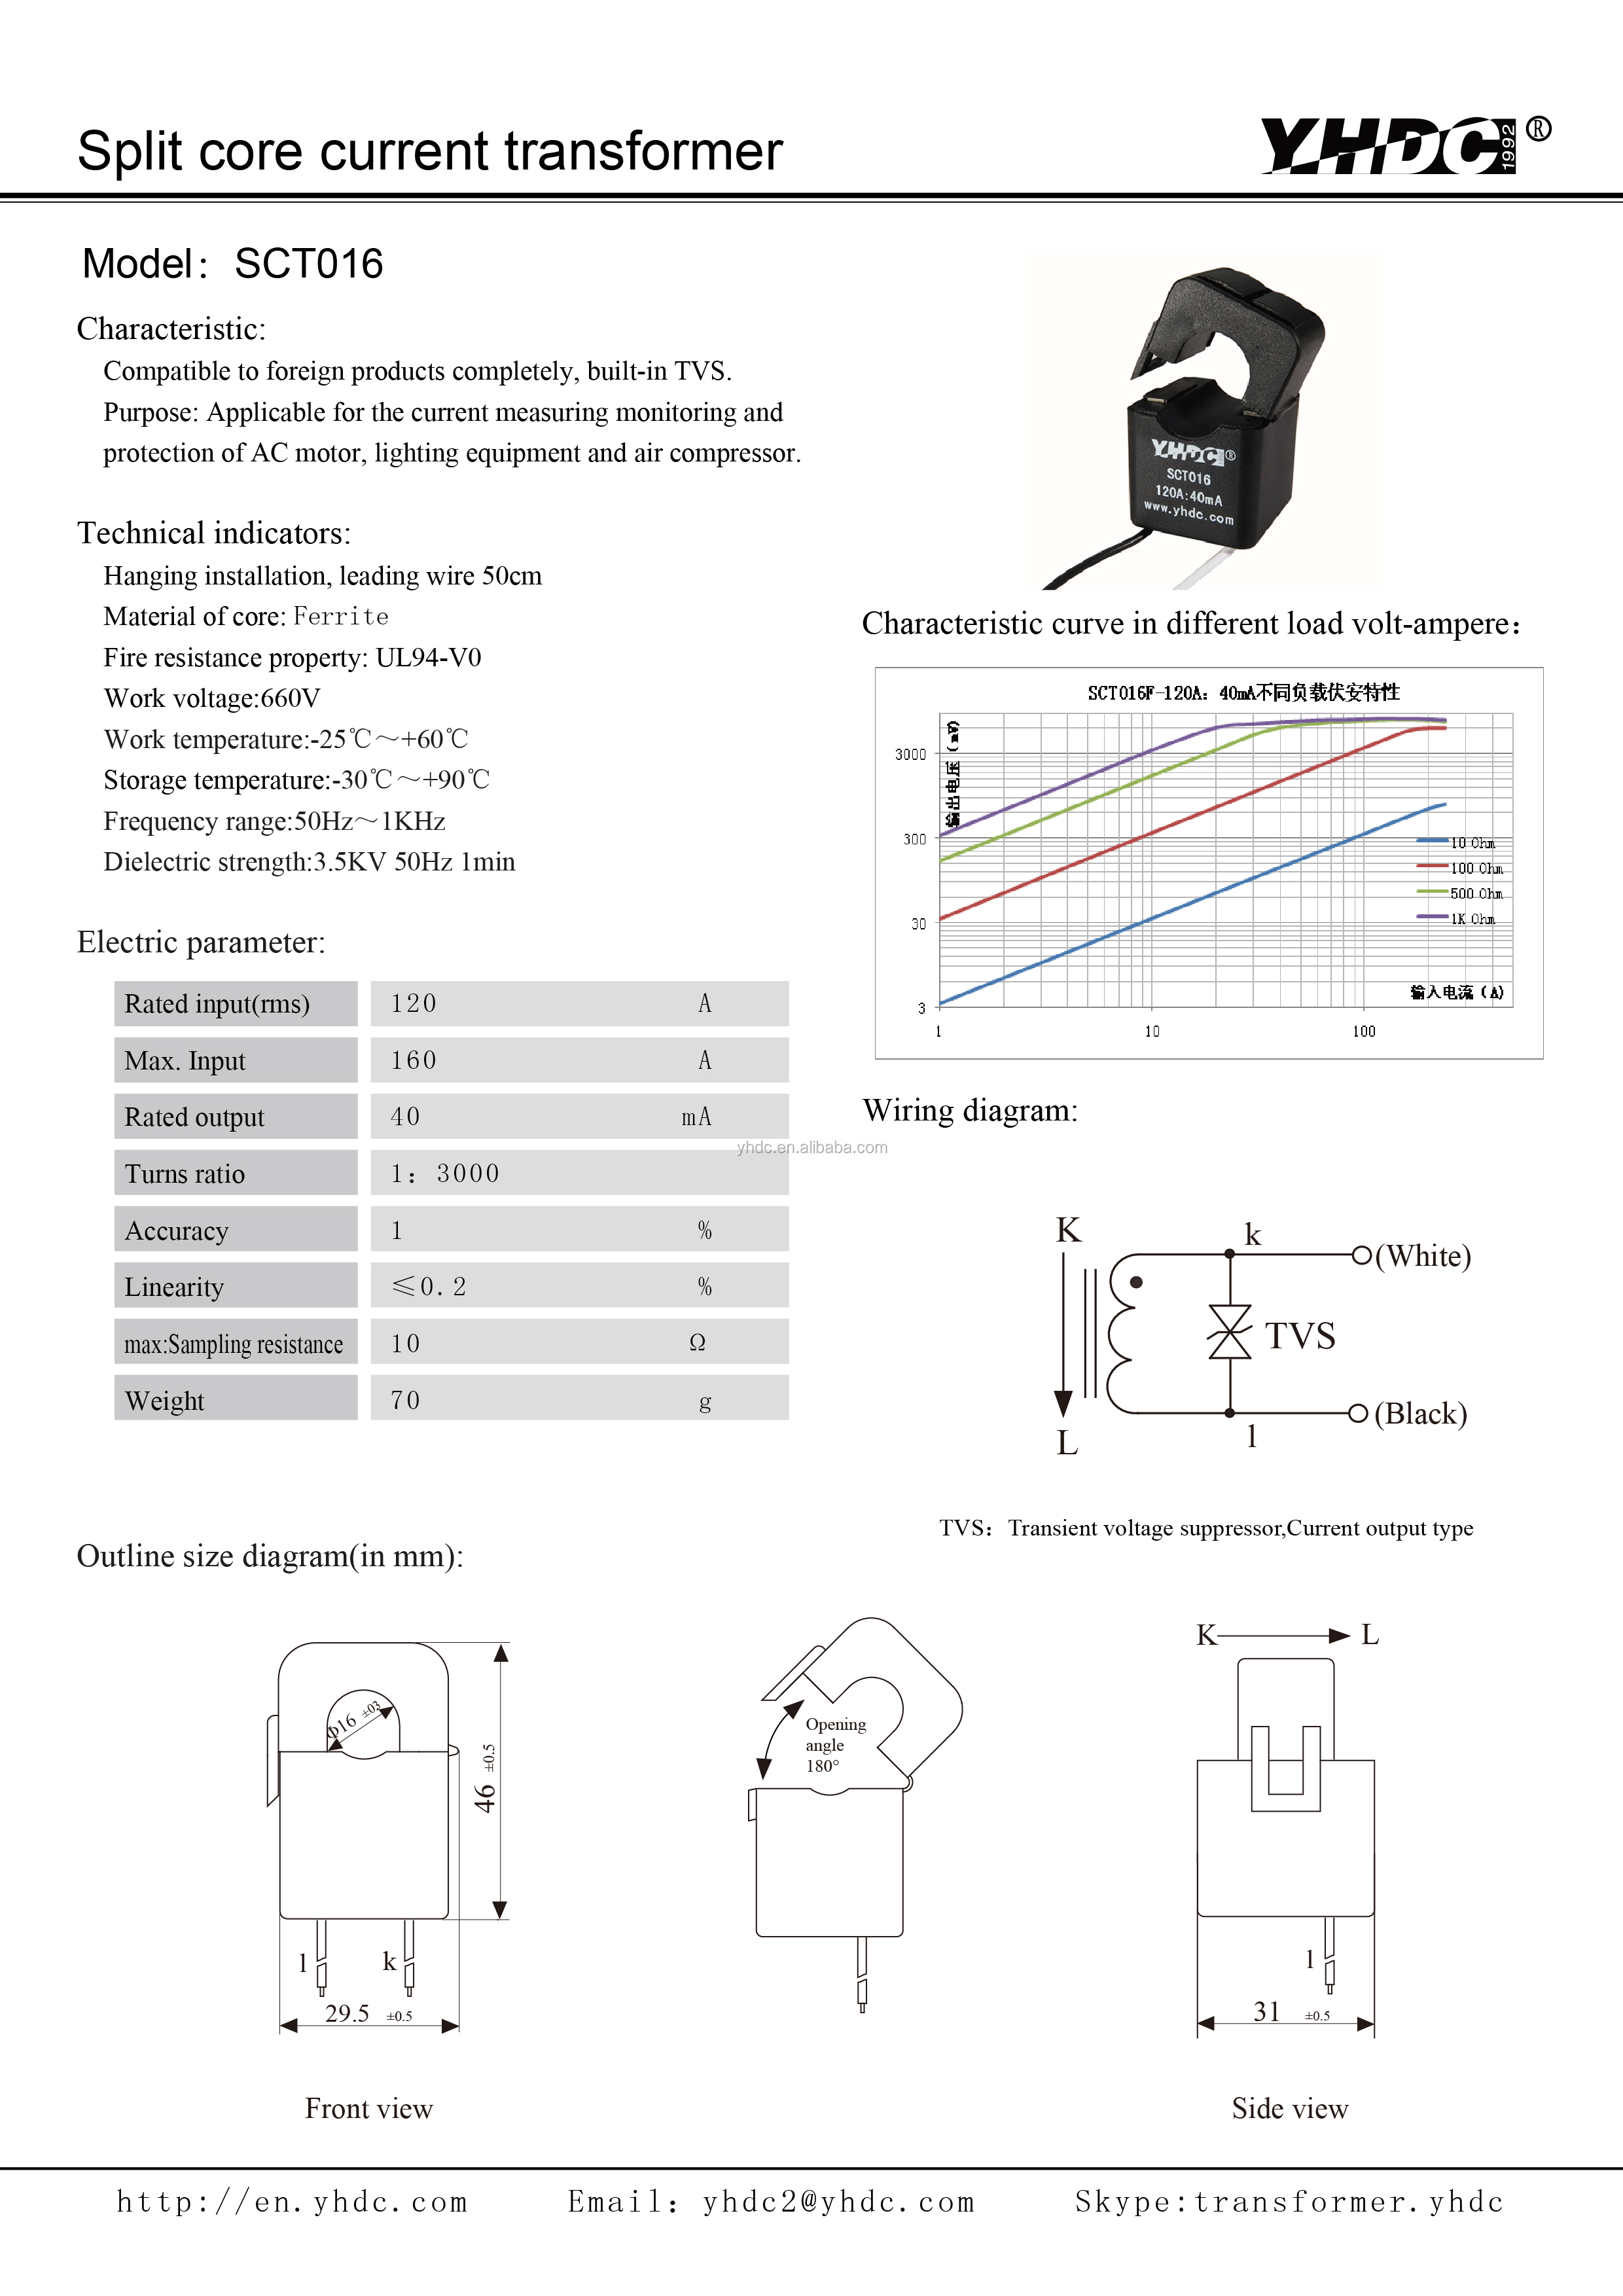 YHDC SCT010 Split Core Current Transformer Input 0.01-80A Output 26.6mA Black